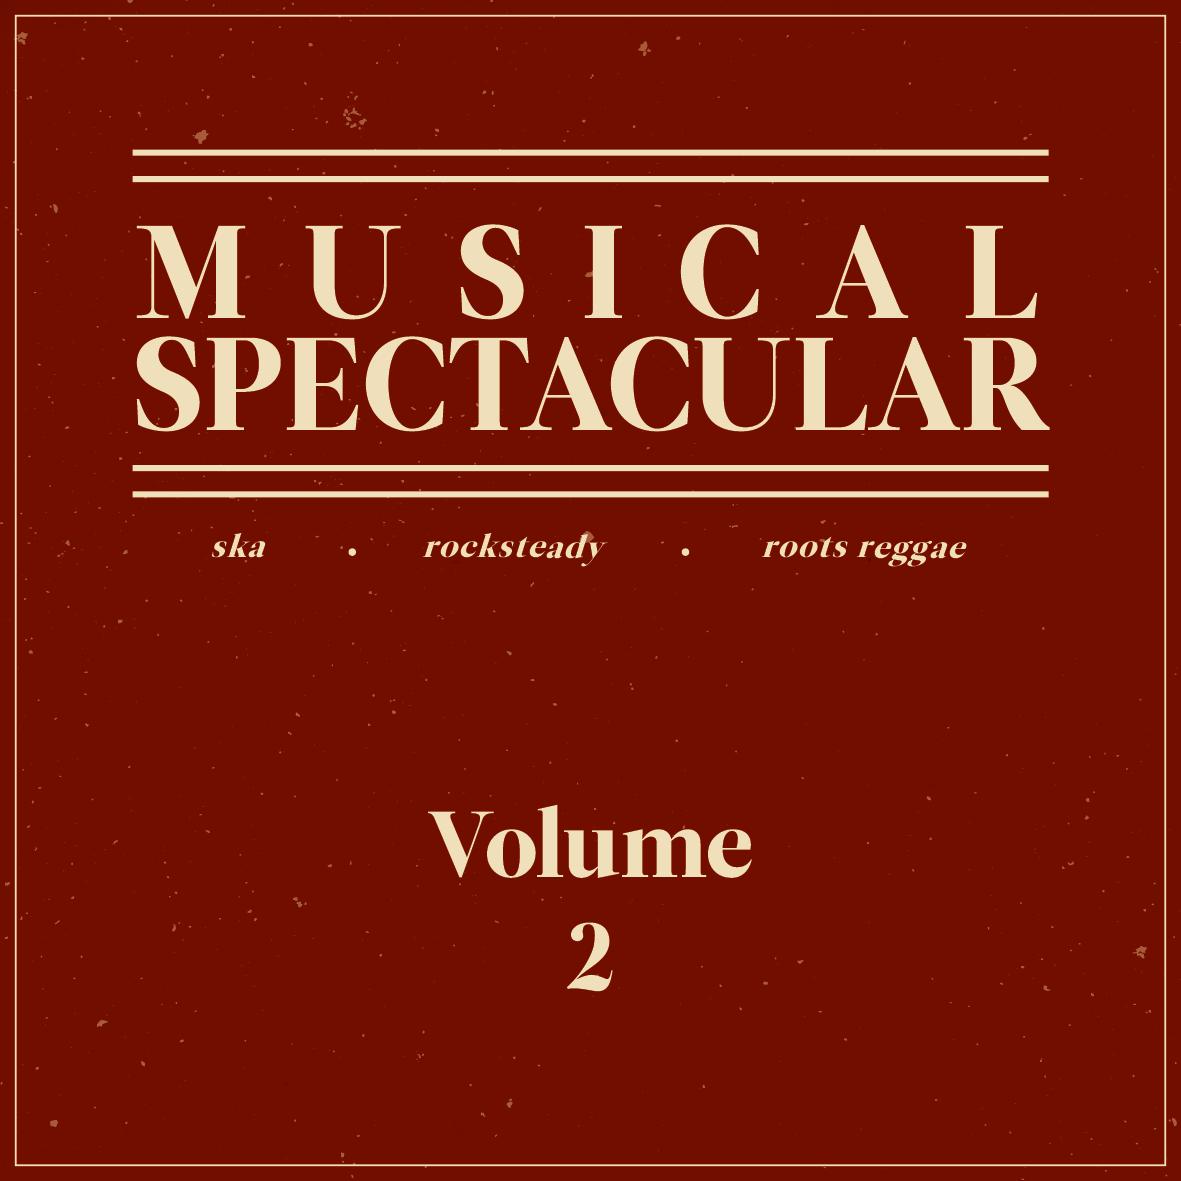 MusicalSpecatcular_VOL2.jpg